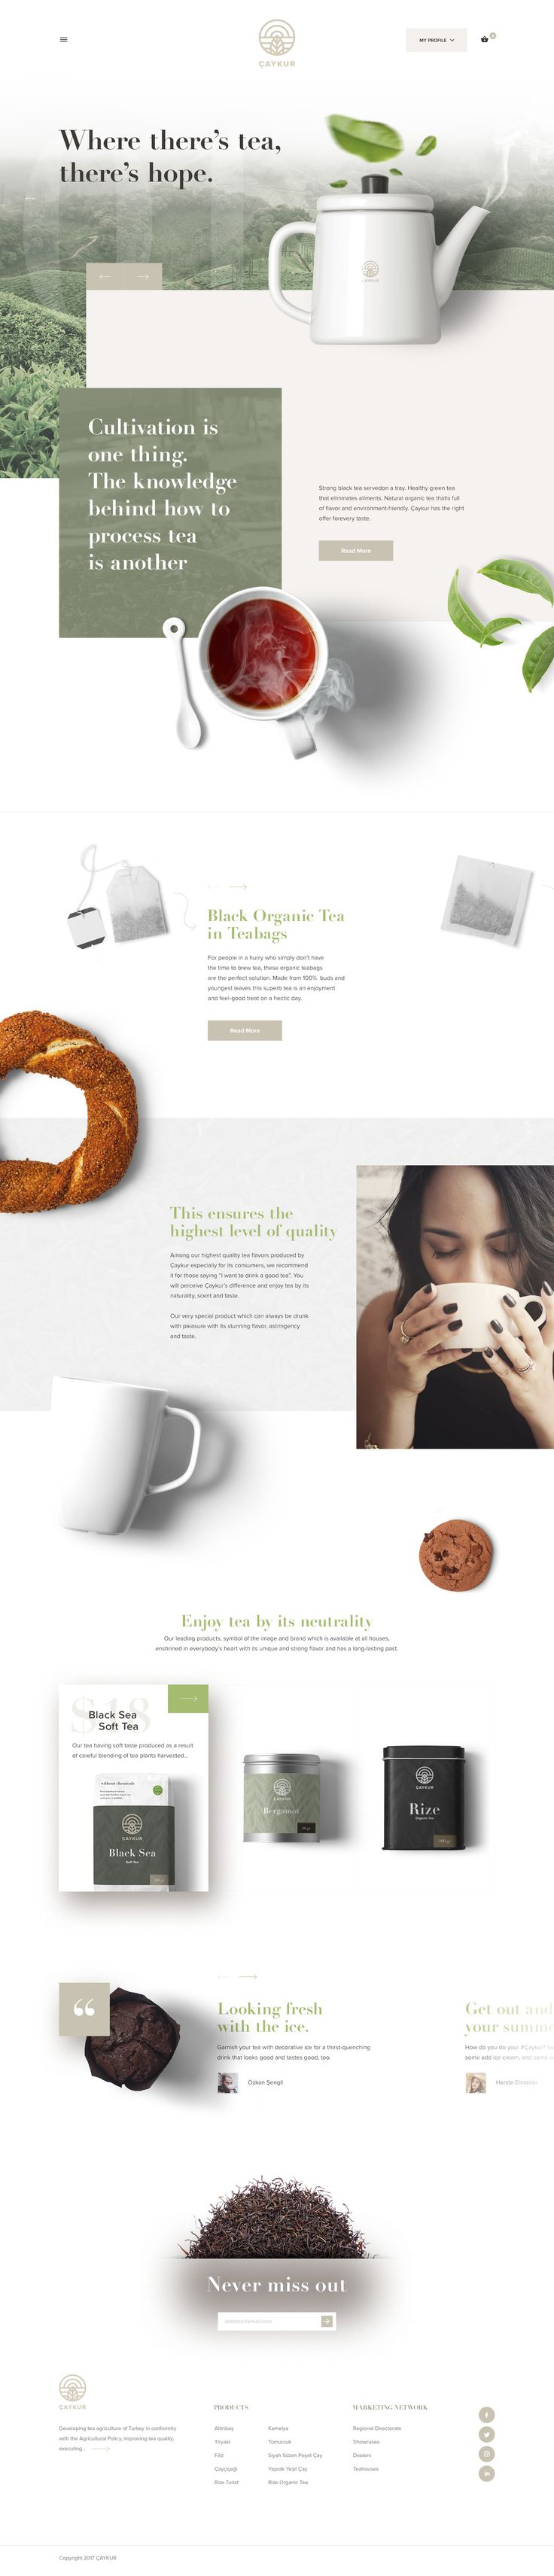 Caykur homepage